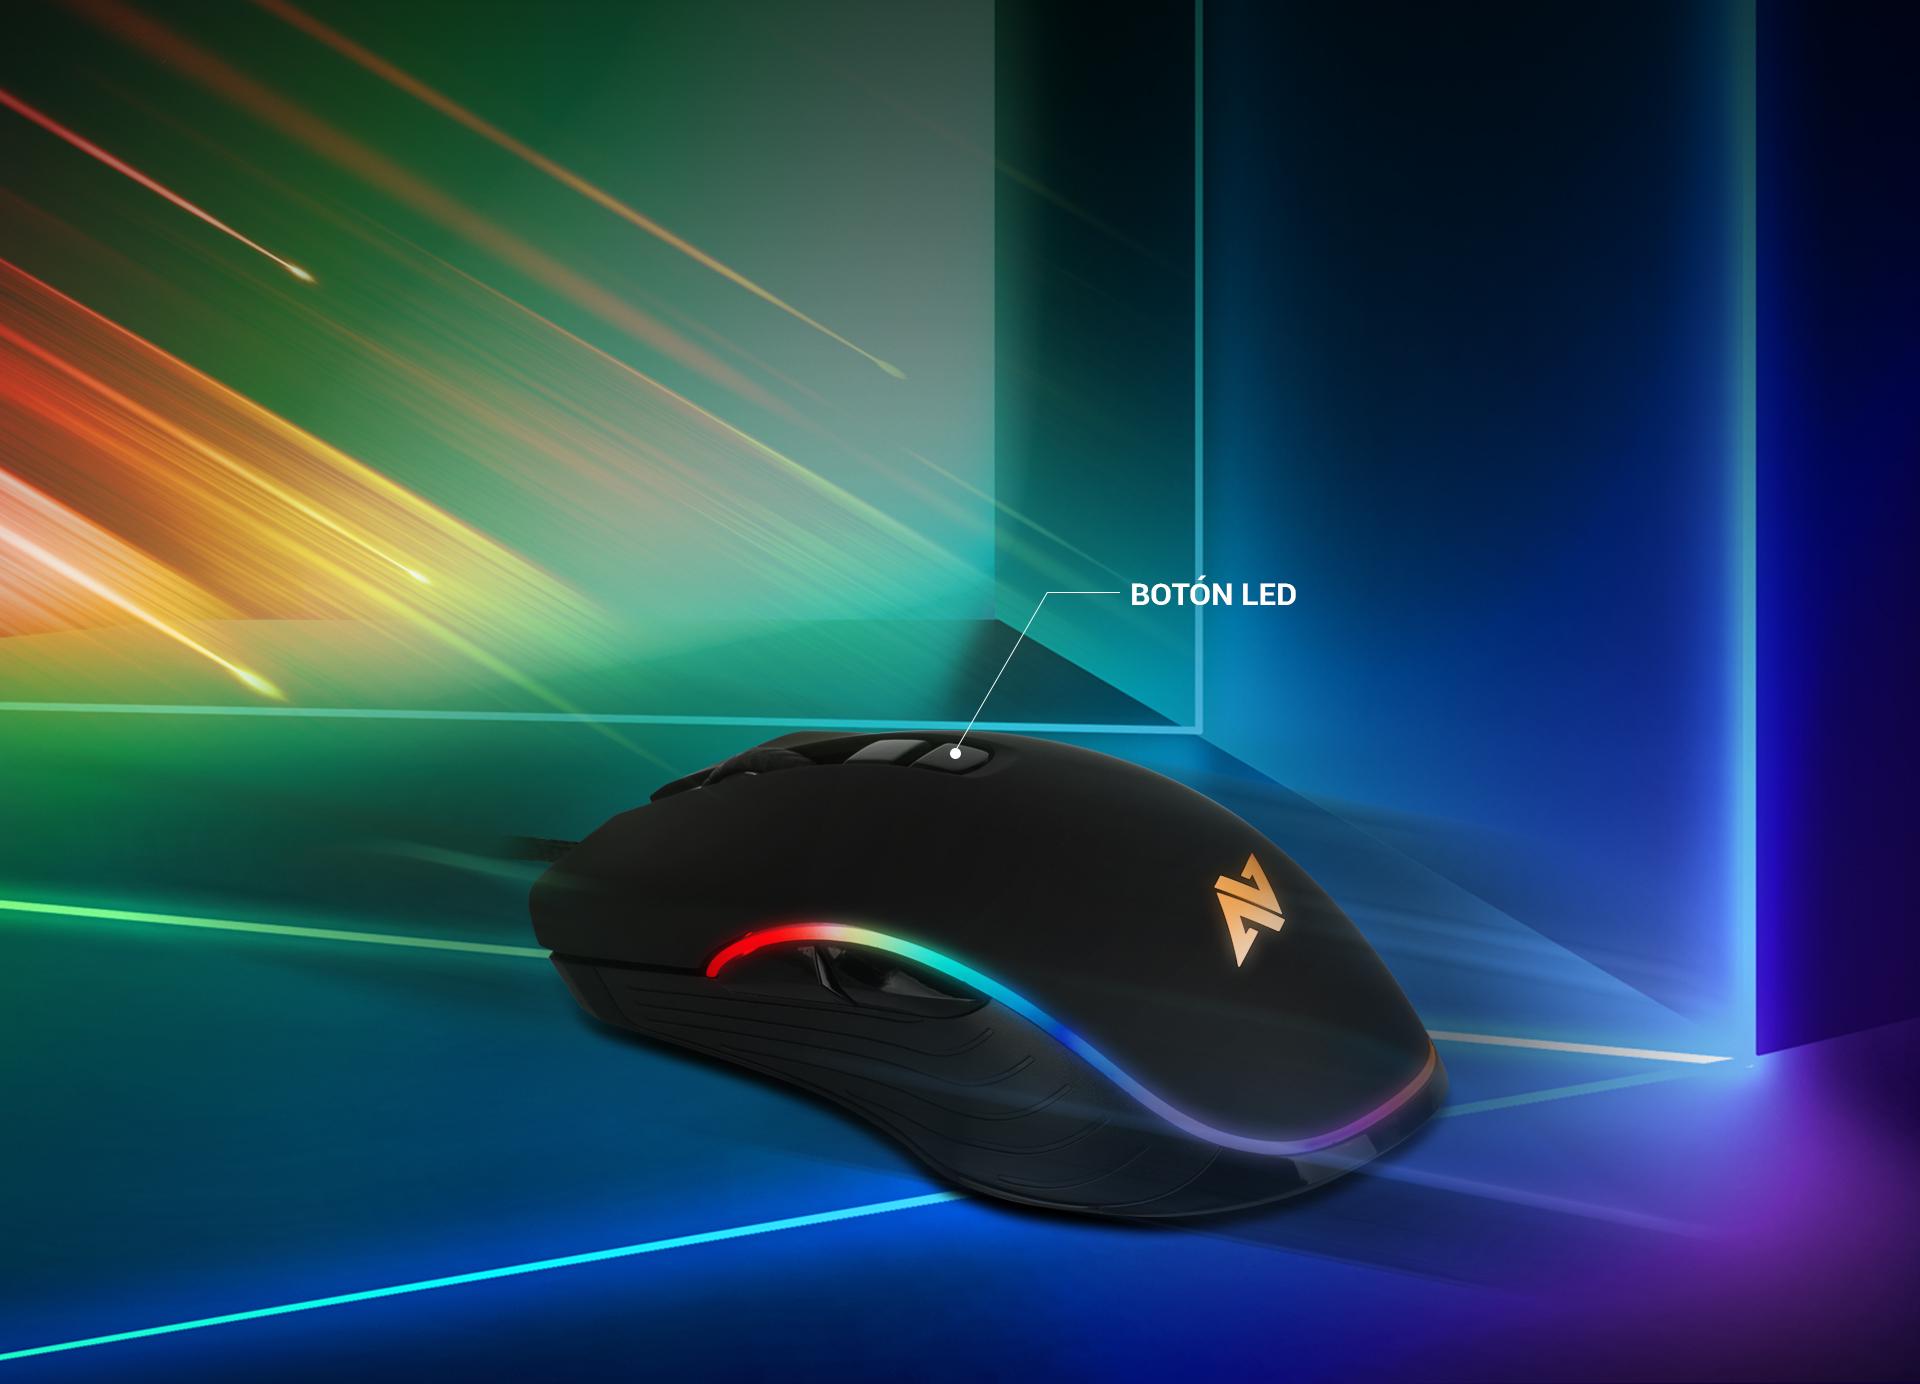 Ratón Gaming Astra AM6 imagen descripción colores led